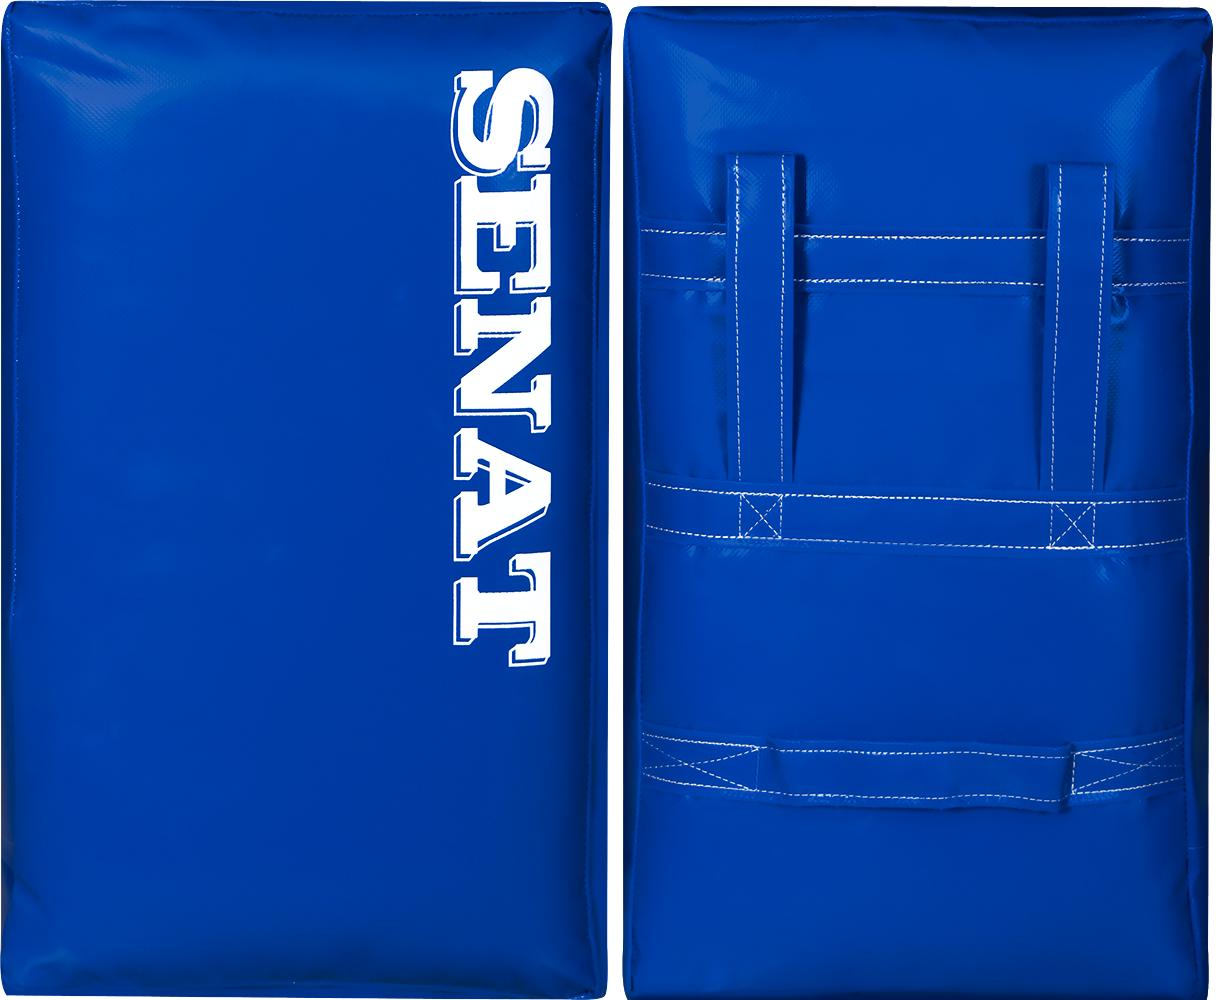 Макивара двойная, ПВХ, 58х38х17см., синяя, 1314-bl